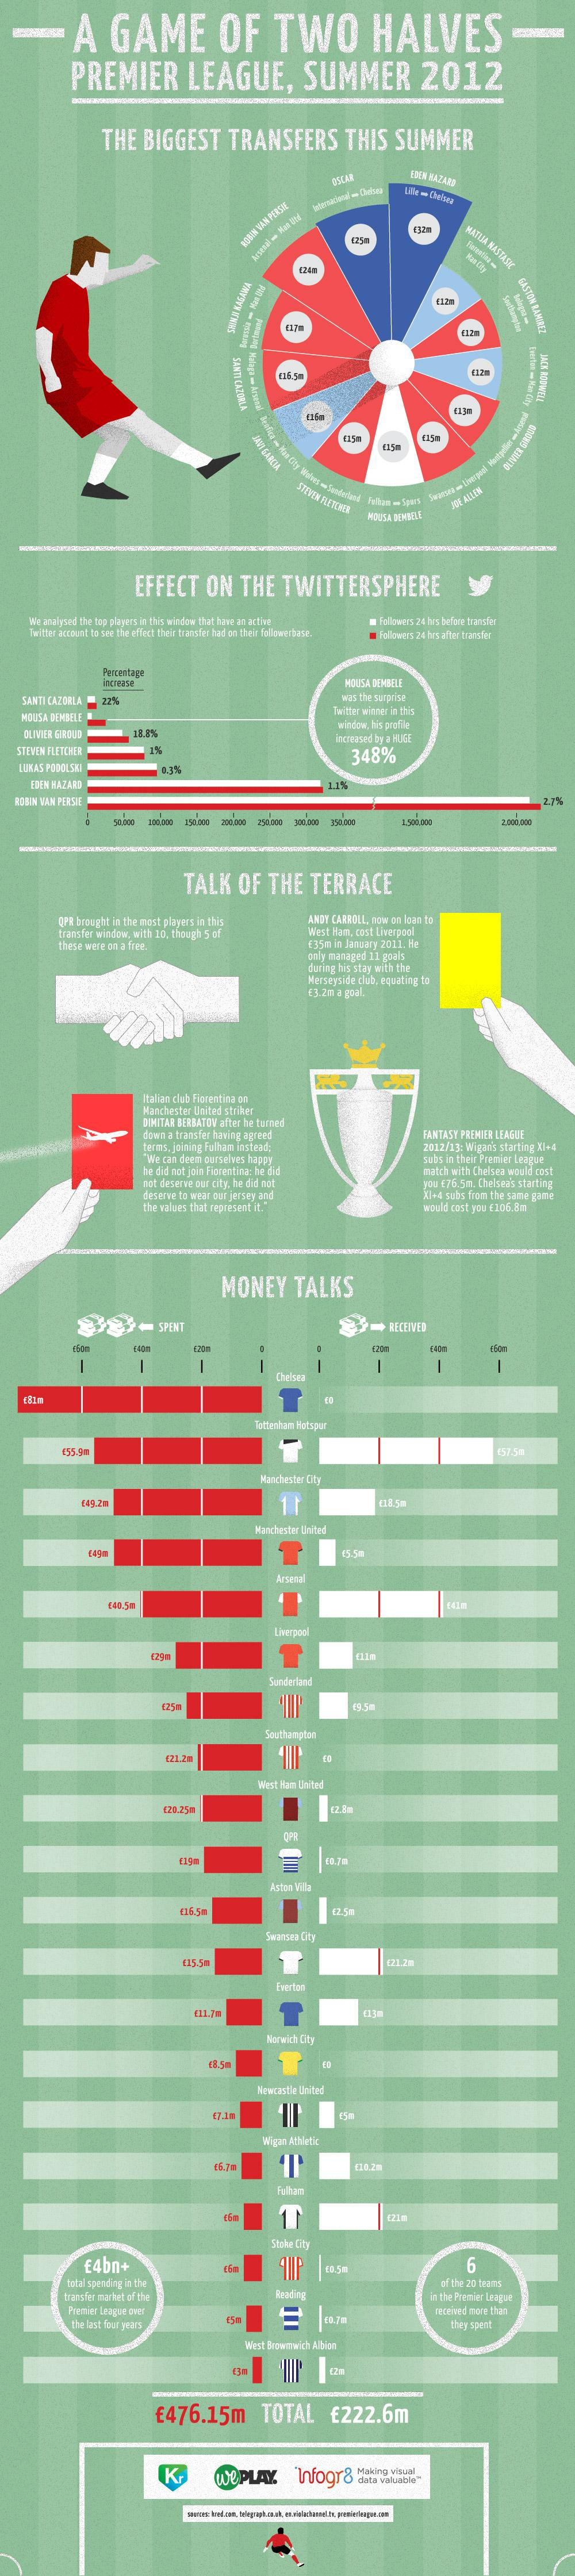 Premier League Summer 2012 Transfer Window infographic